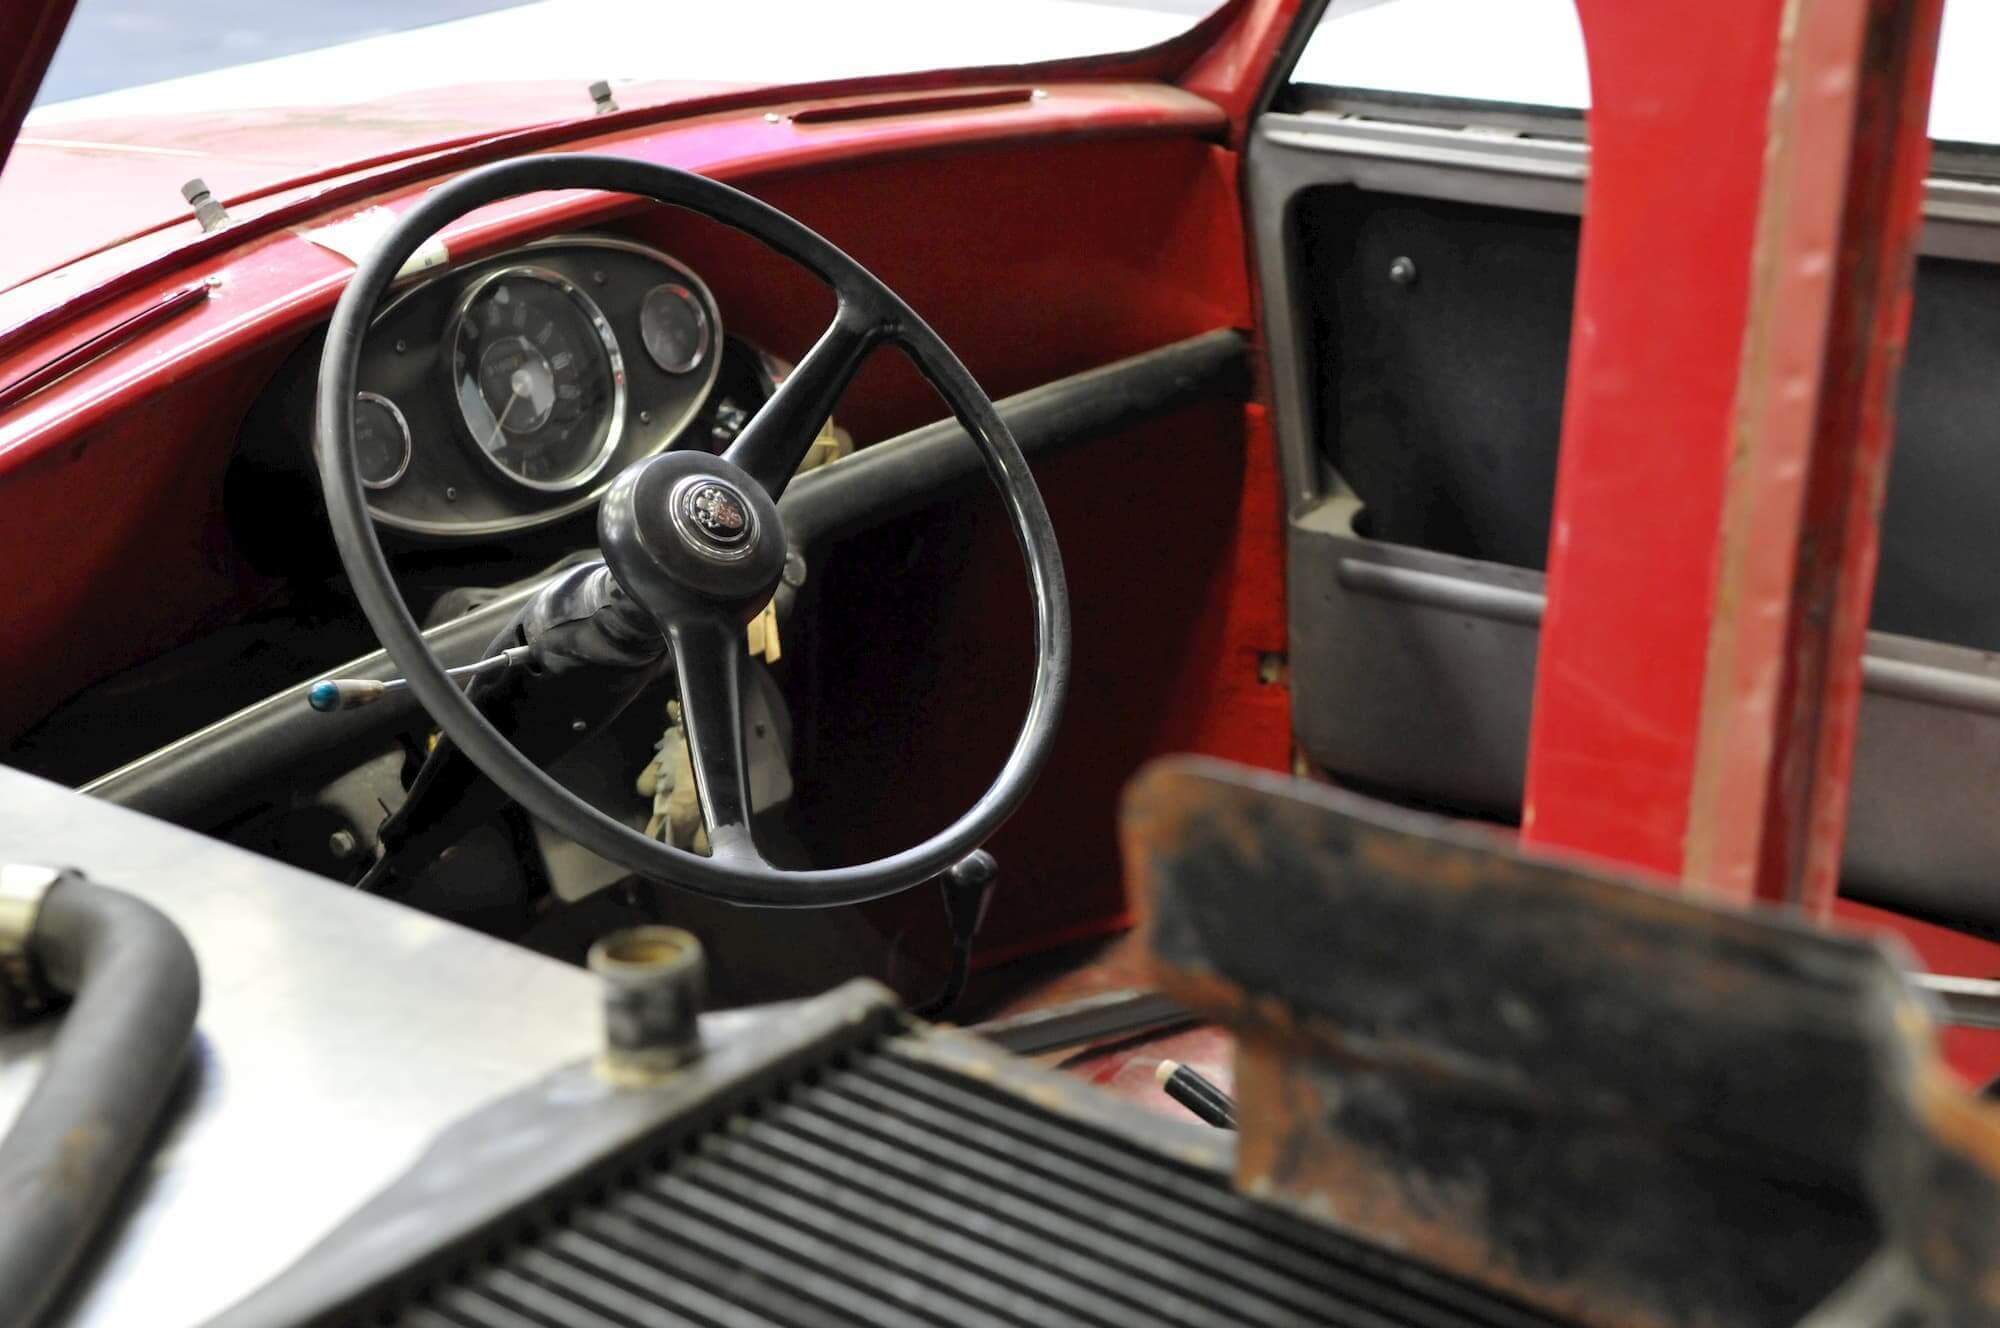 mini austin - mk1 - vintage cars - voiture ancienne